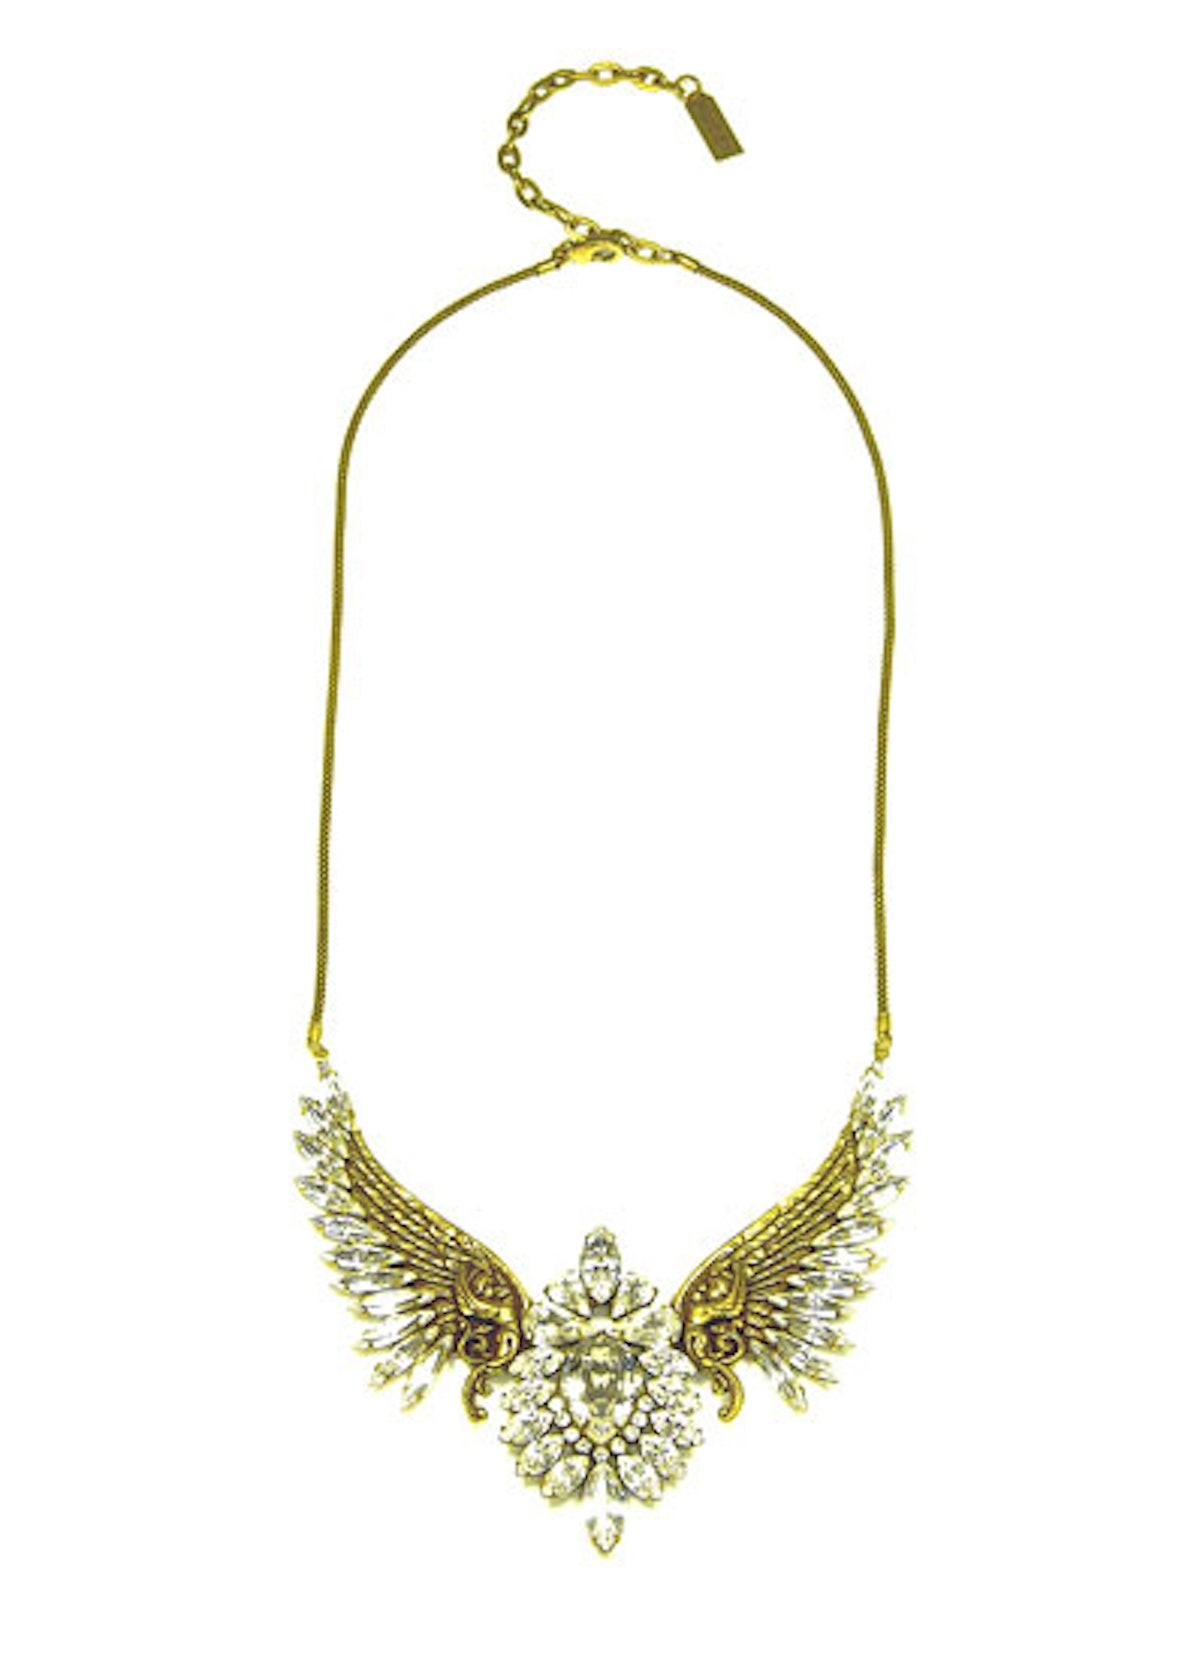 acss-decades-costume-jewelry-21-v.jpg